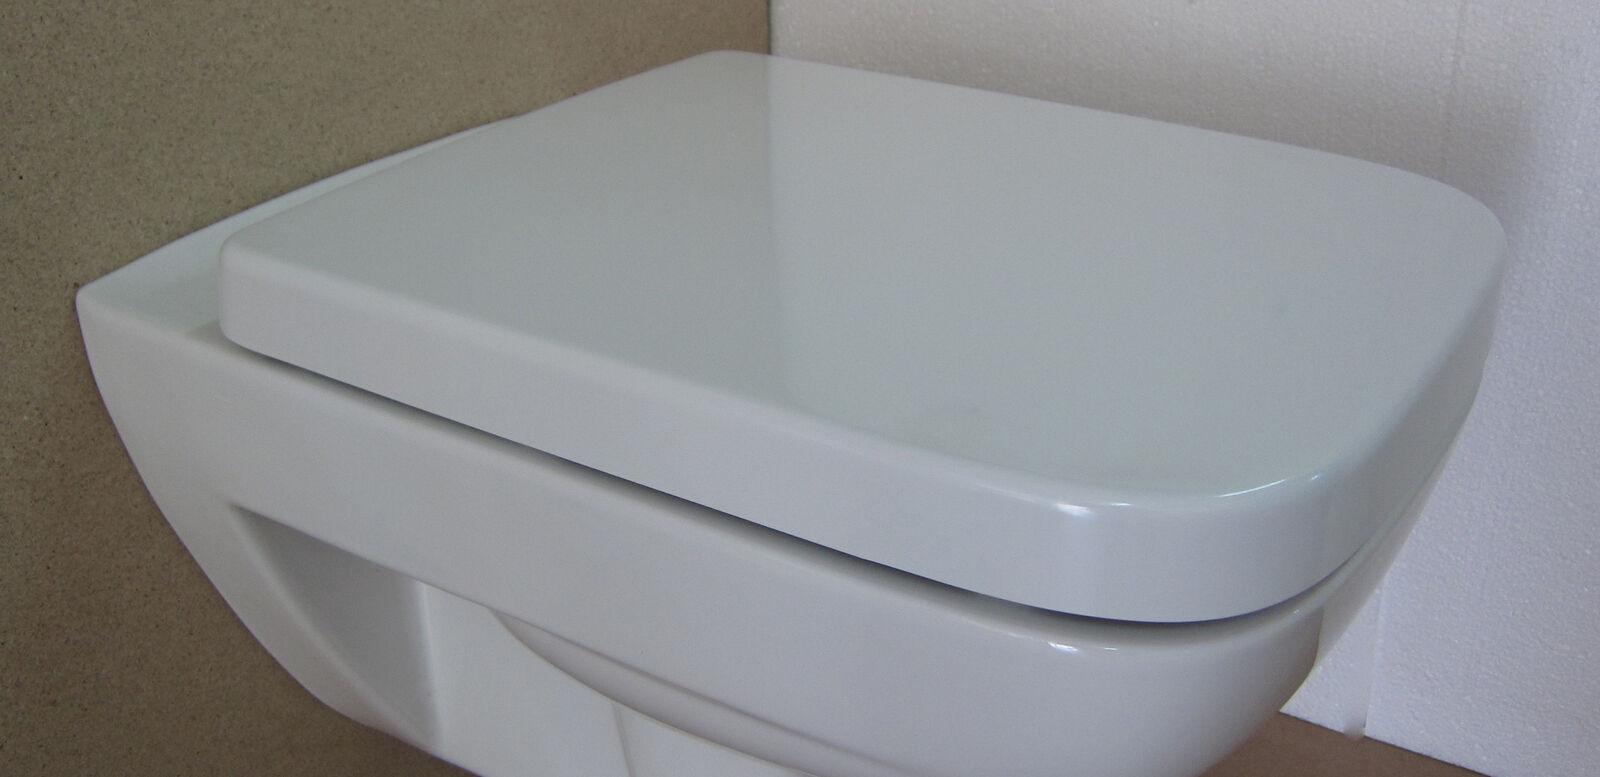 WC Sitz softclose zu Keramag Wand WC Renova Nr.1 Plan / 202150 / 202160 / 206145